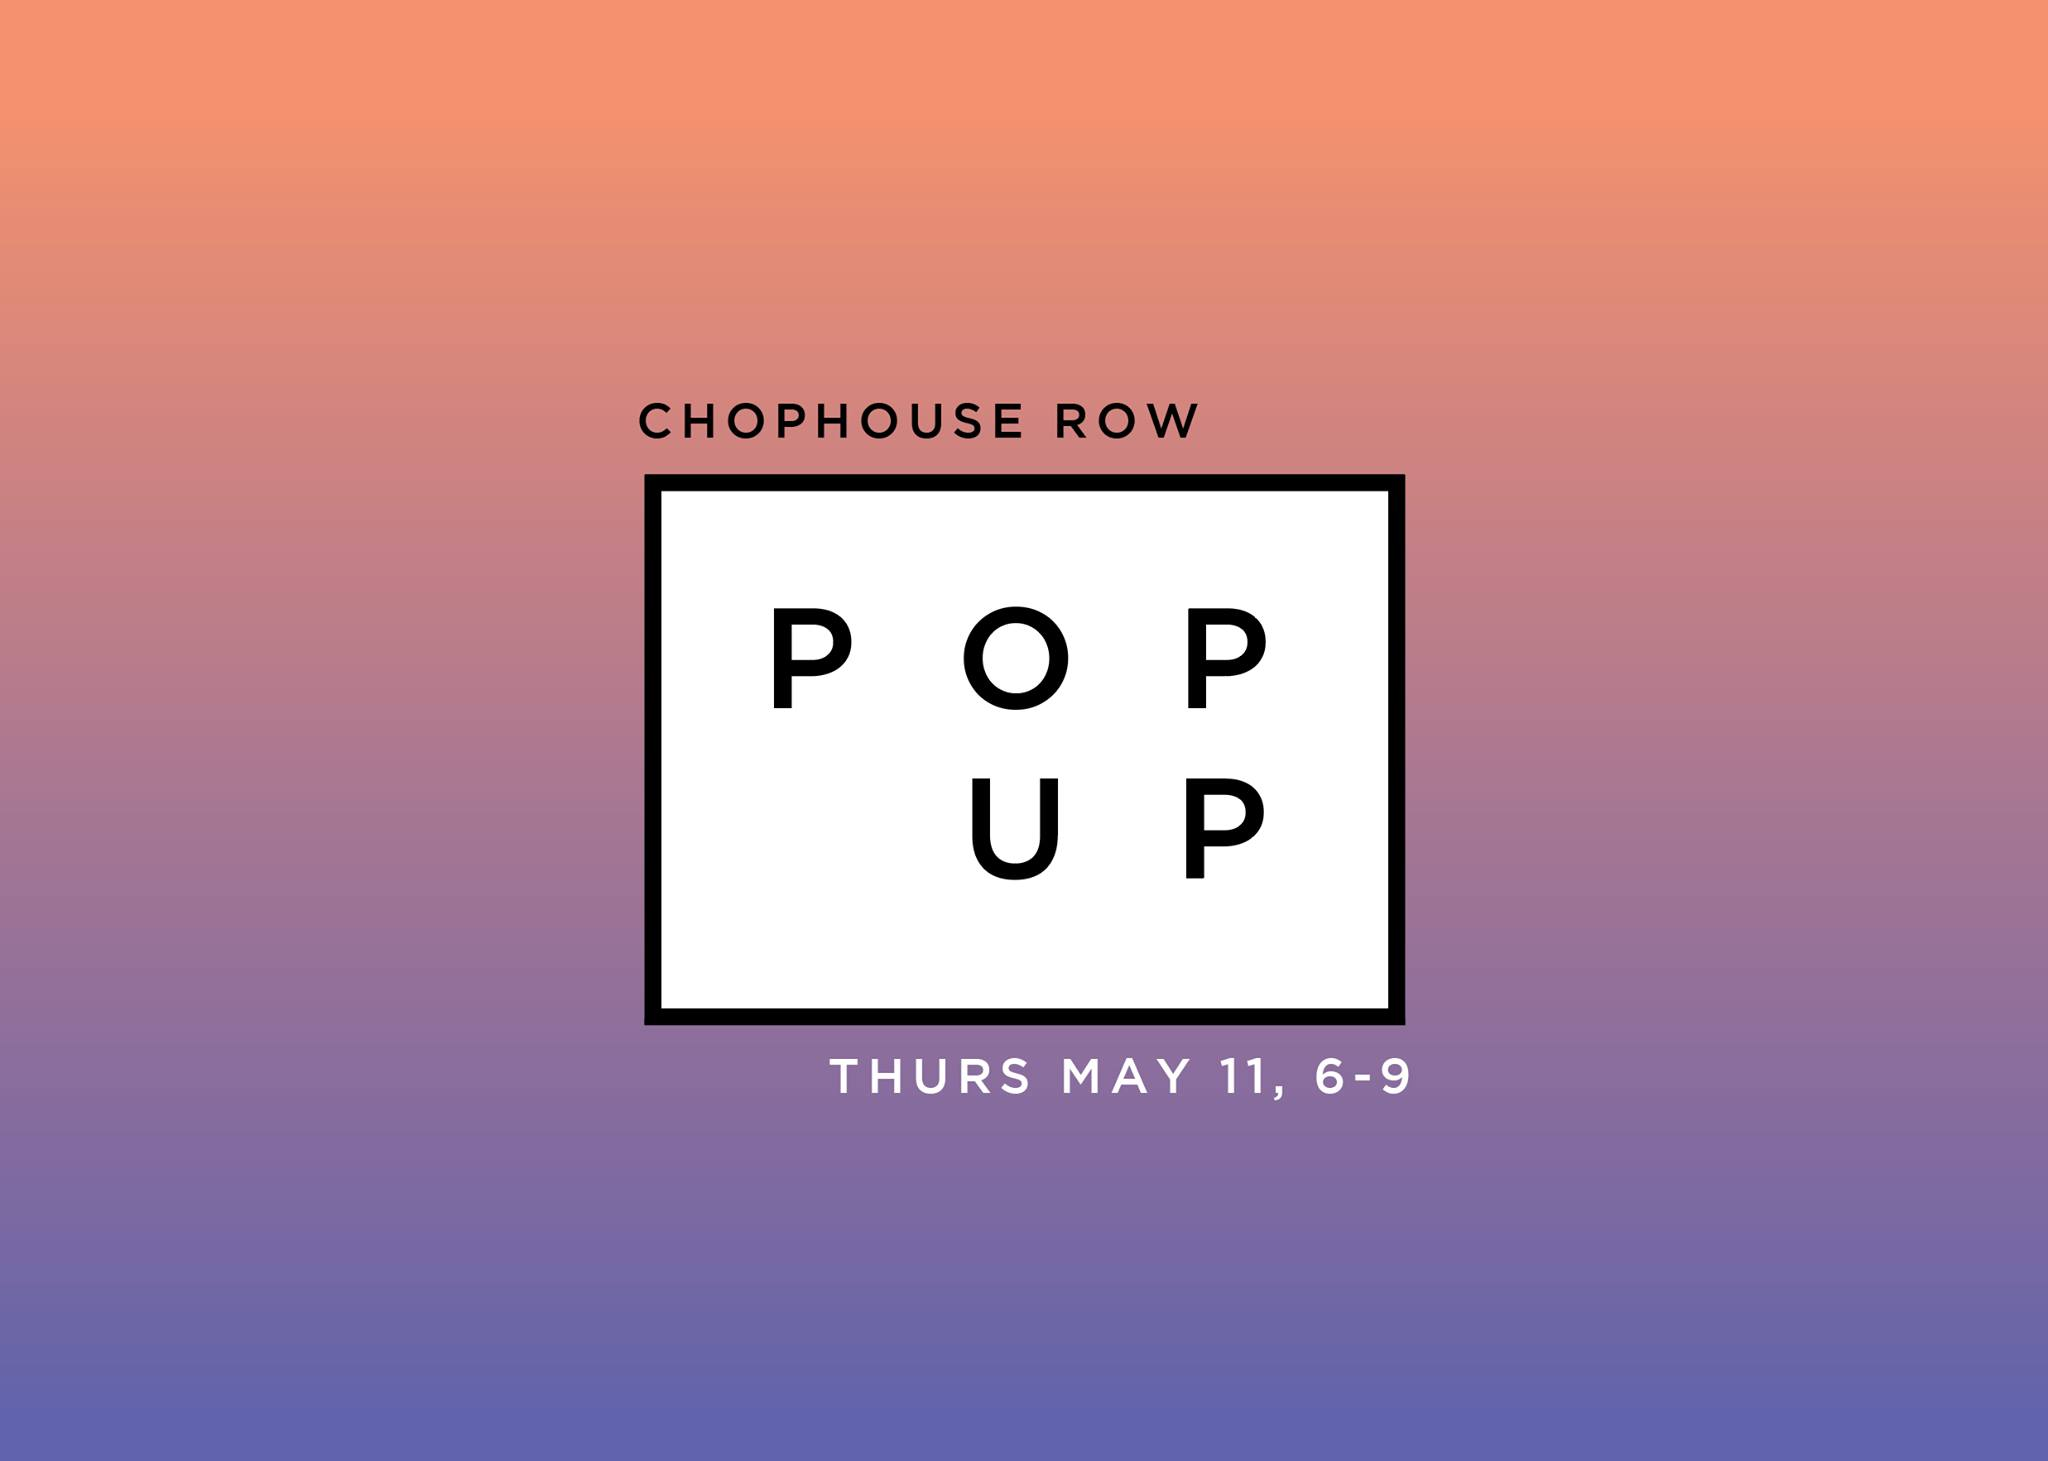 chophouse row pop up marketplace